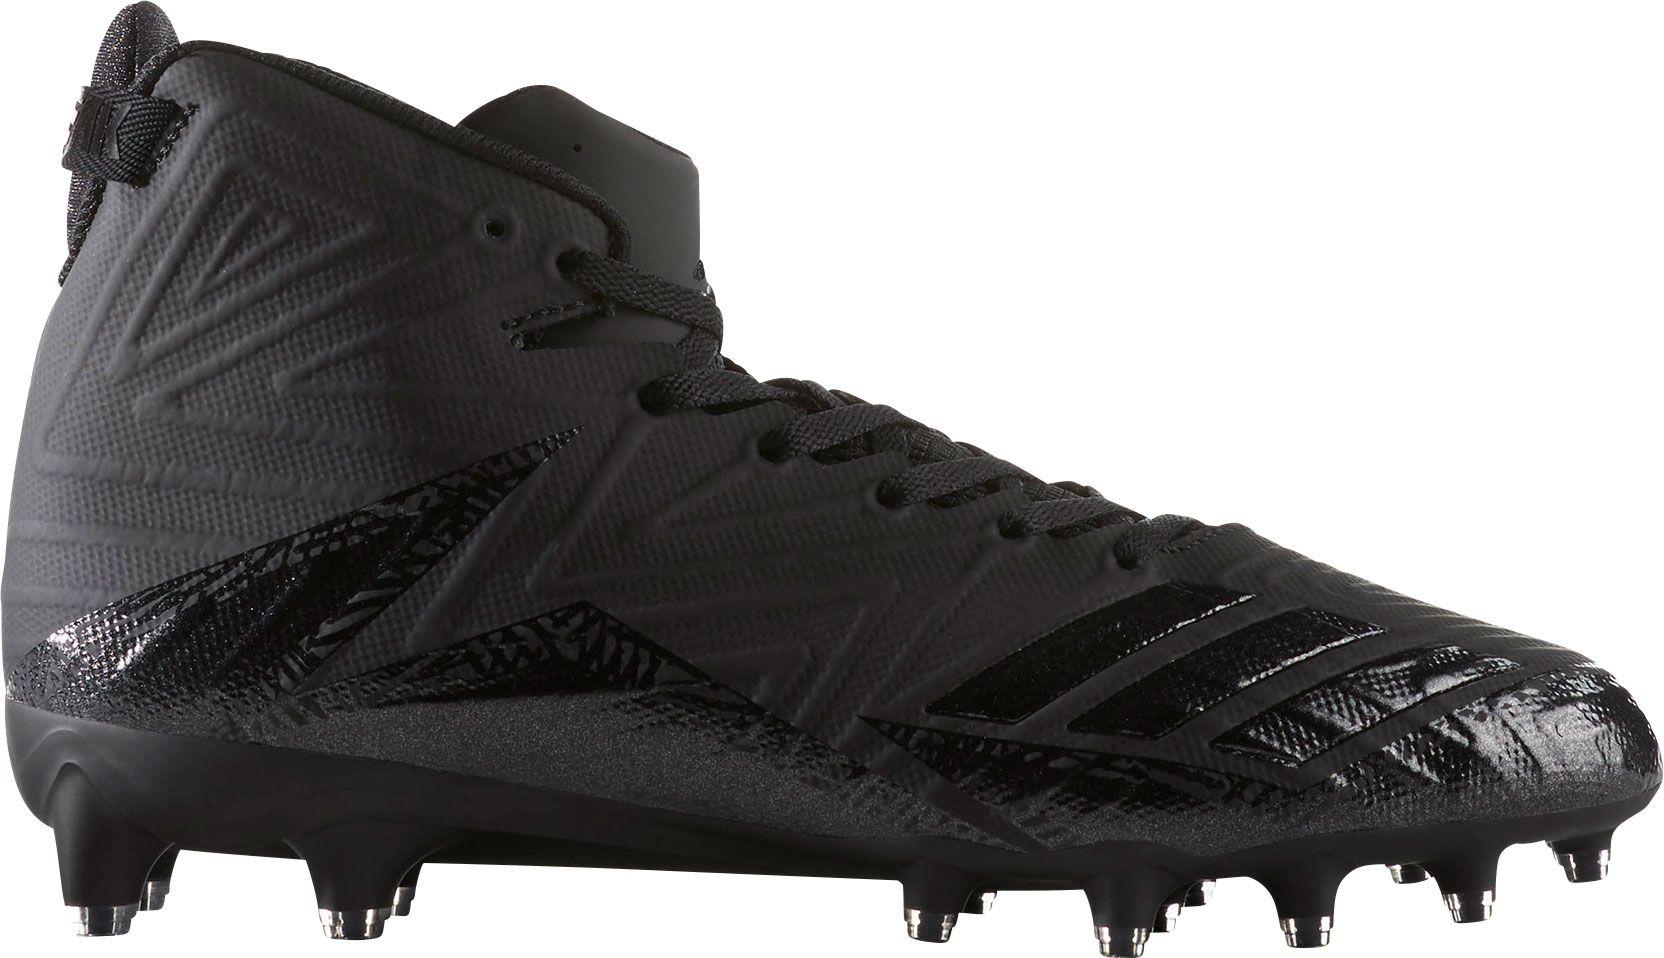 cheaper 6248e 29ad4 adidas Mens Freak X Carbon Mid Football Cleats DICKS Sporting Goods new